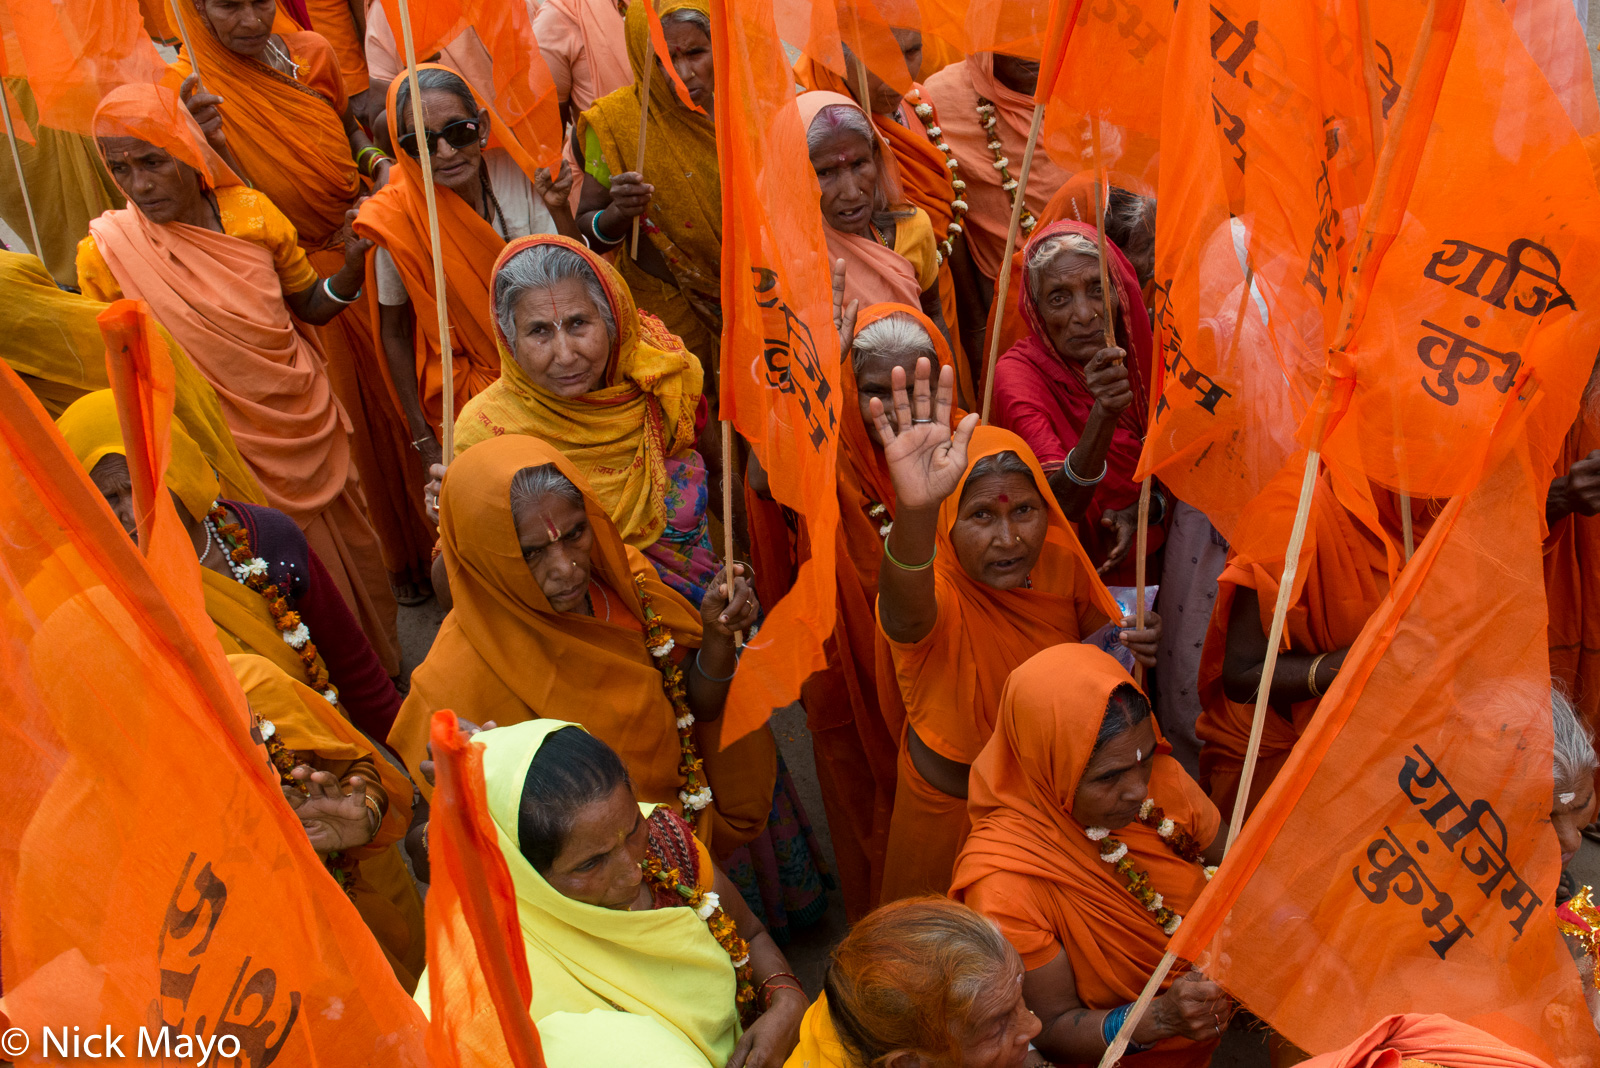 Chhattisgarh, Festival, India, Procession, Sadhvi, photo